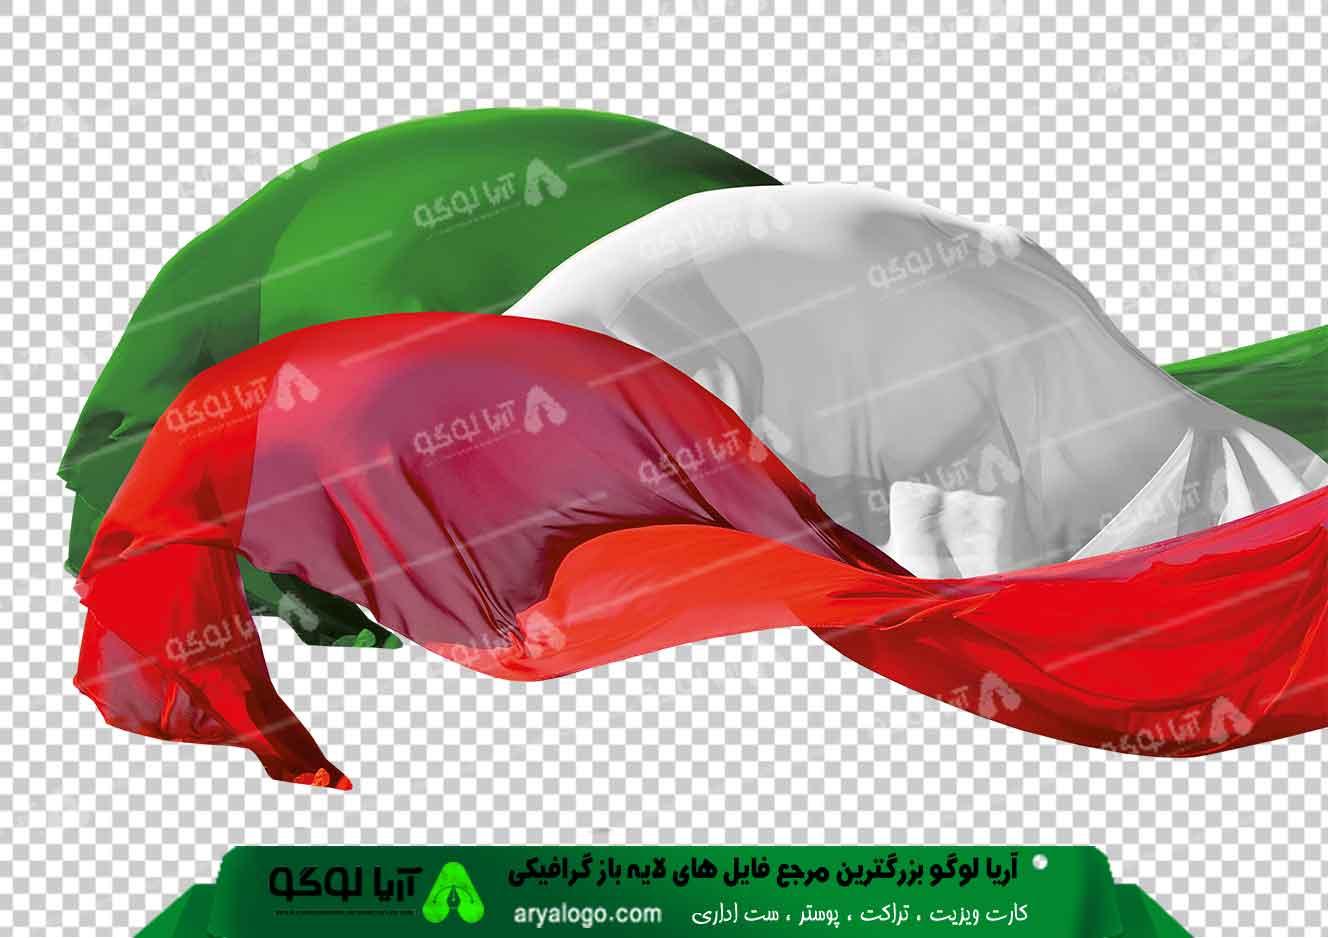 وکتور png پرچم ایران 16